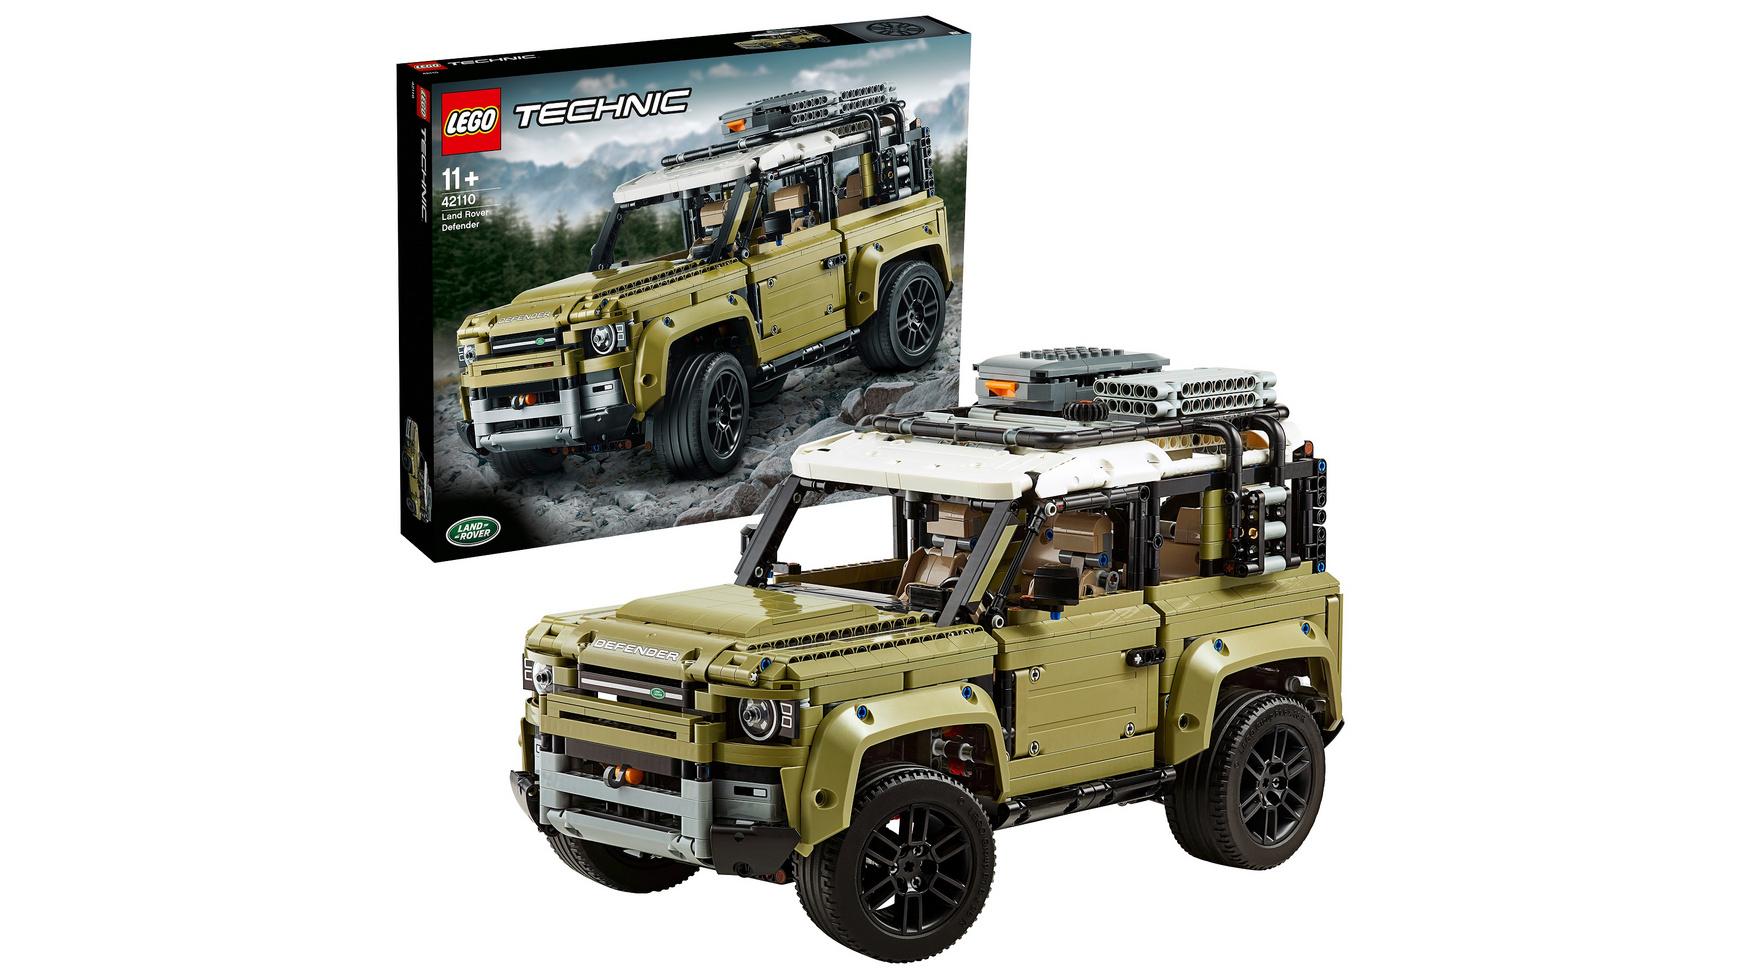 LEGO Technic 42110 Land Rover Defender, mit Rossmann Coupon bei Müller